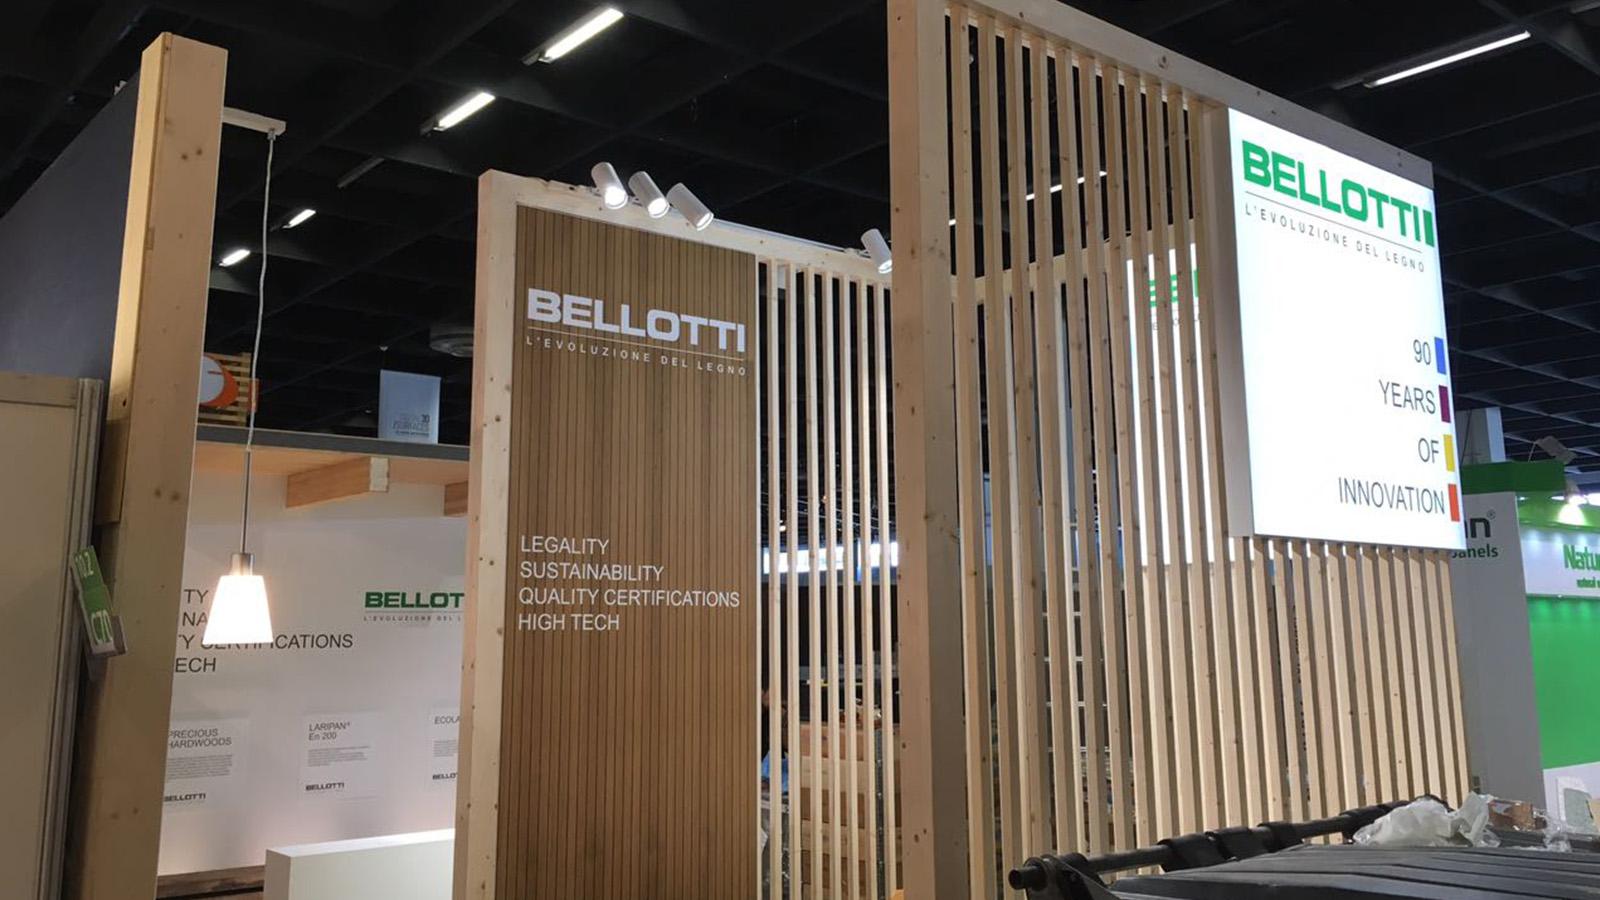 bellotti-interzum-2017-innovation